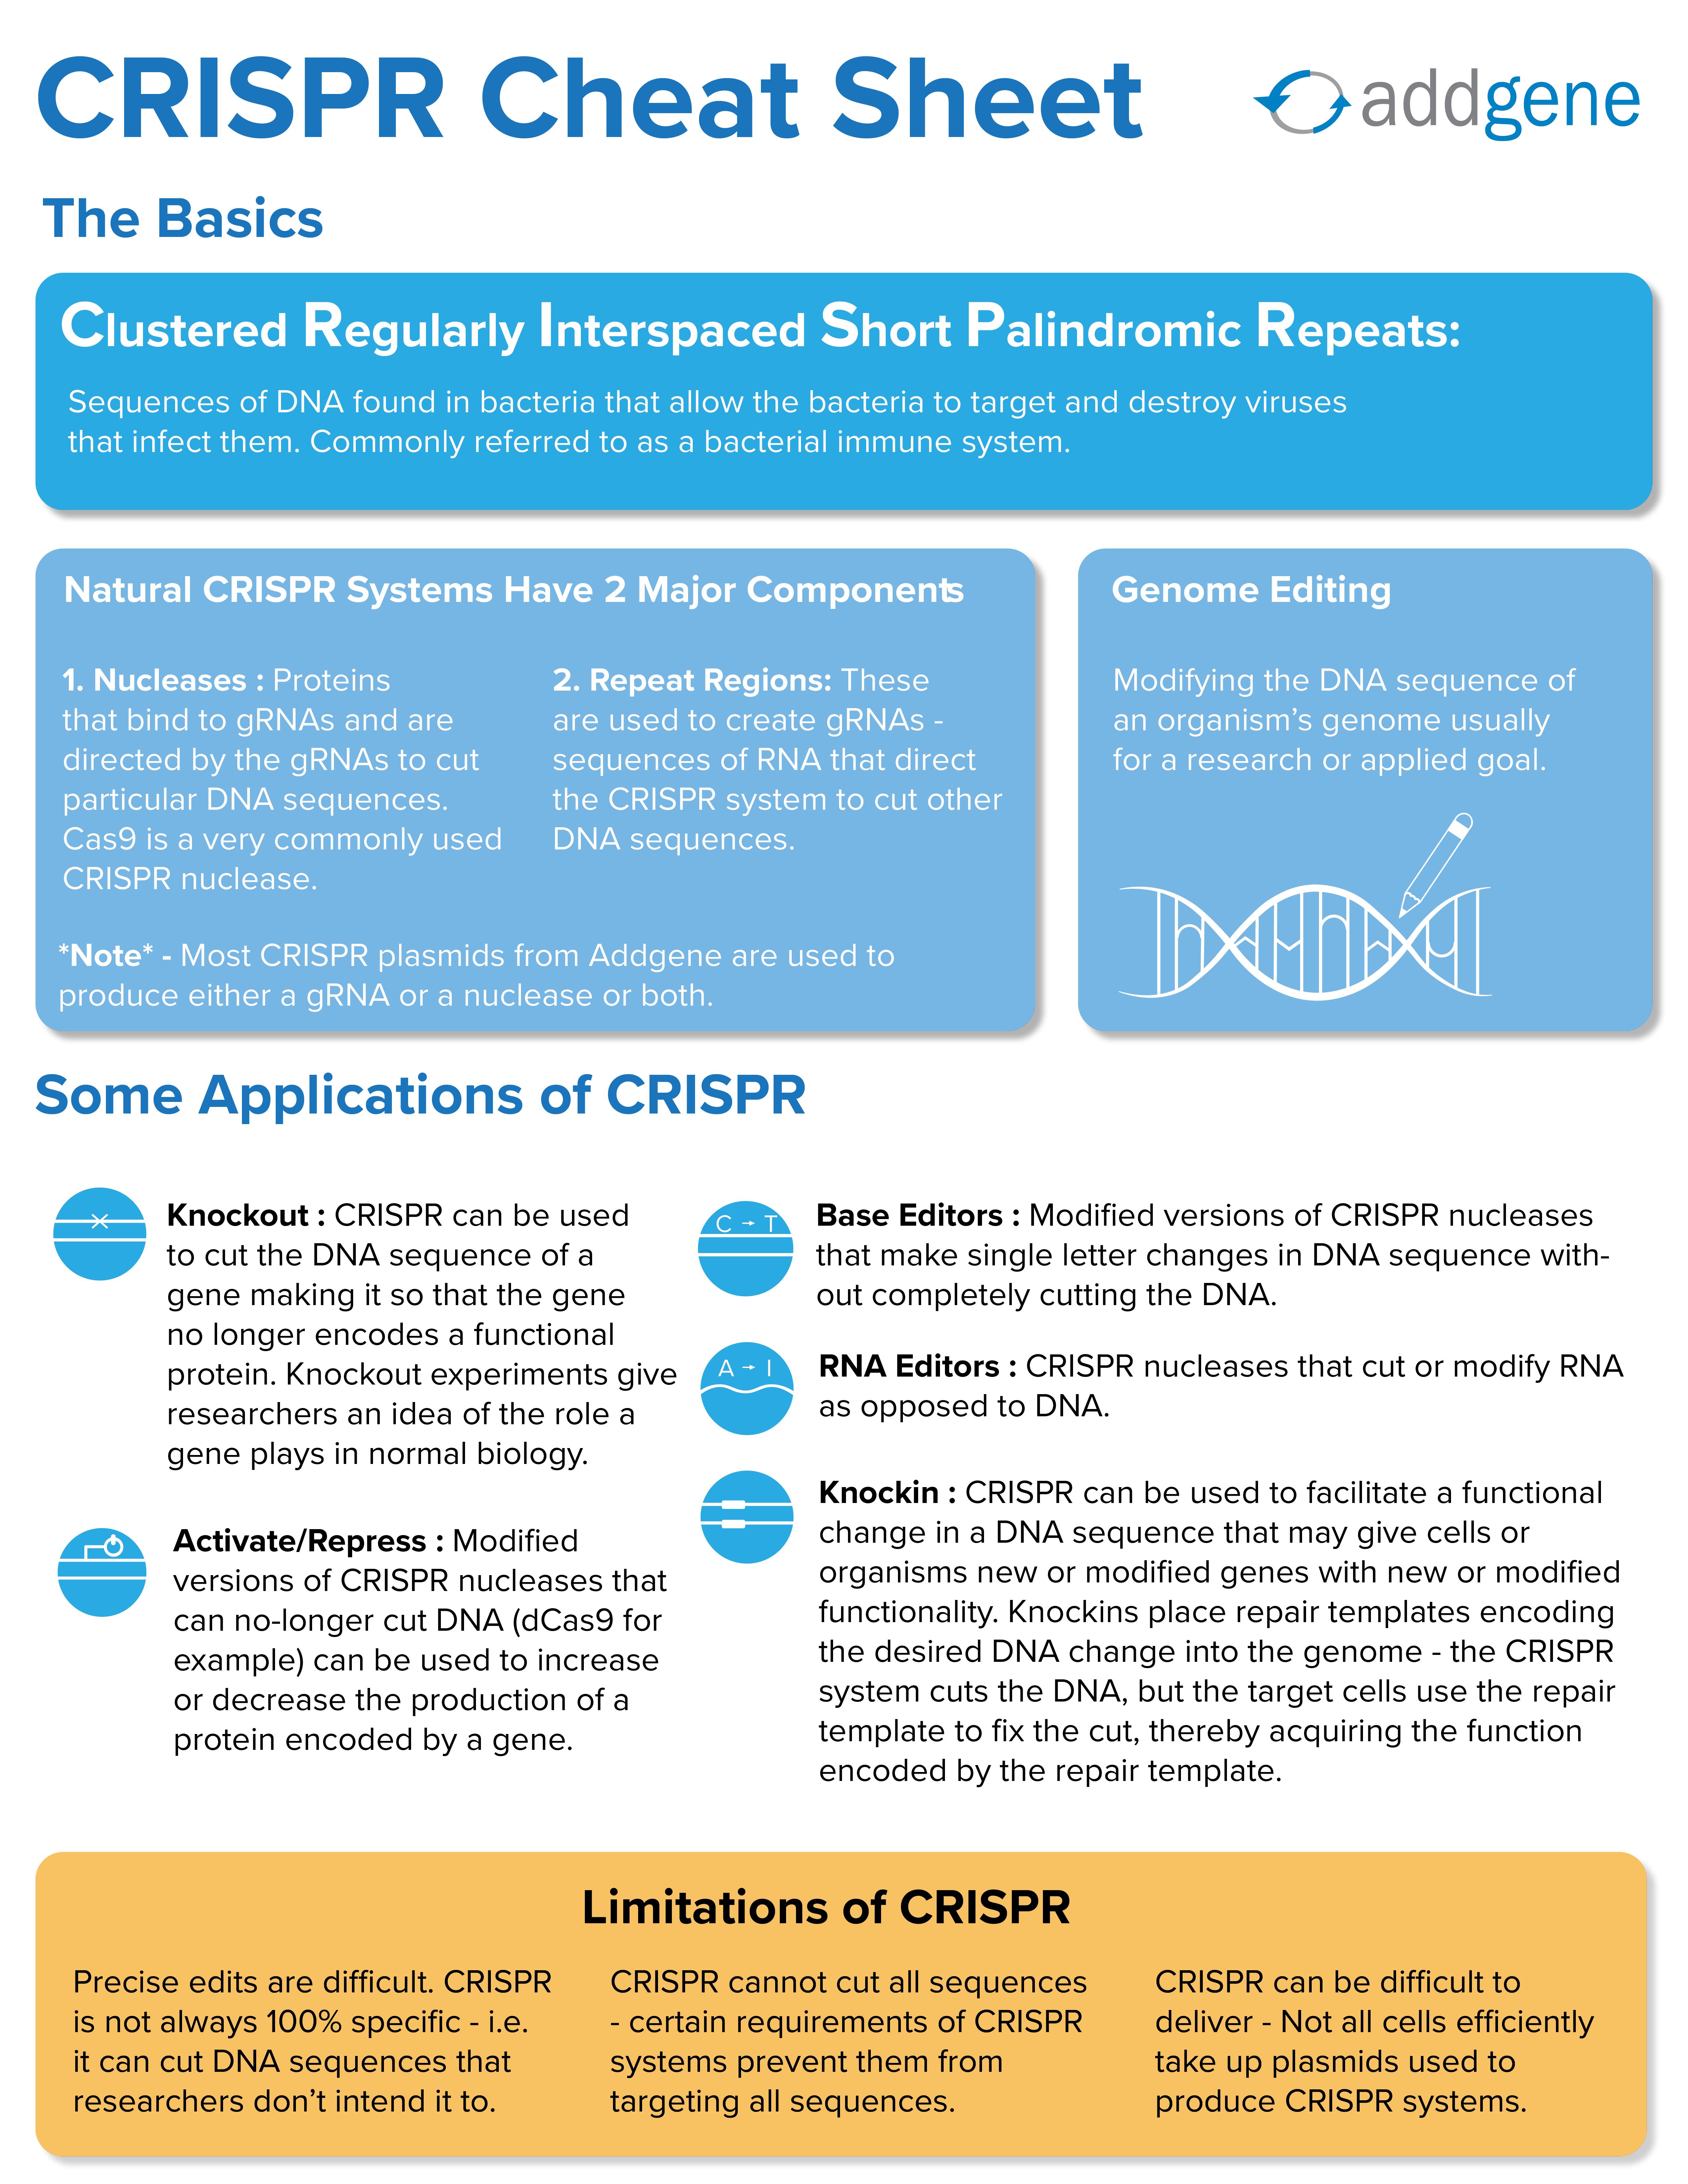 CRISPR_Cheat_Sheet2